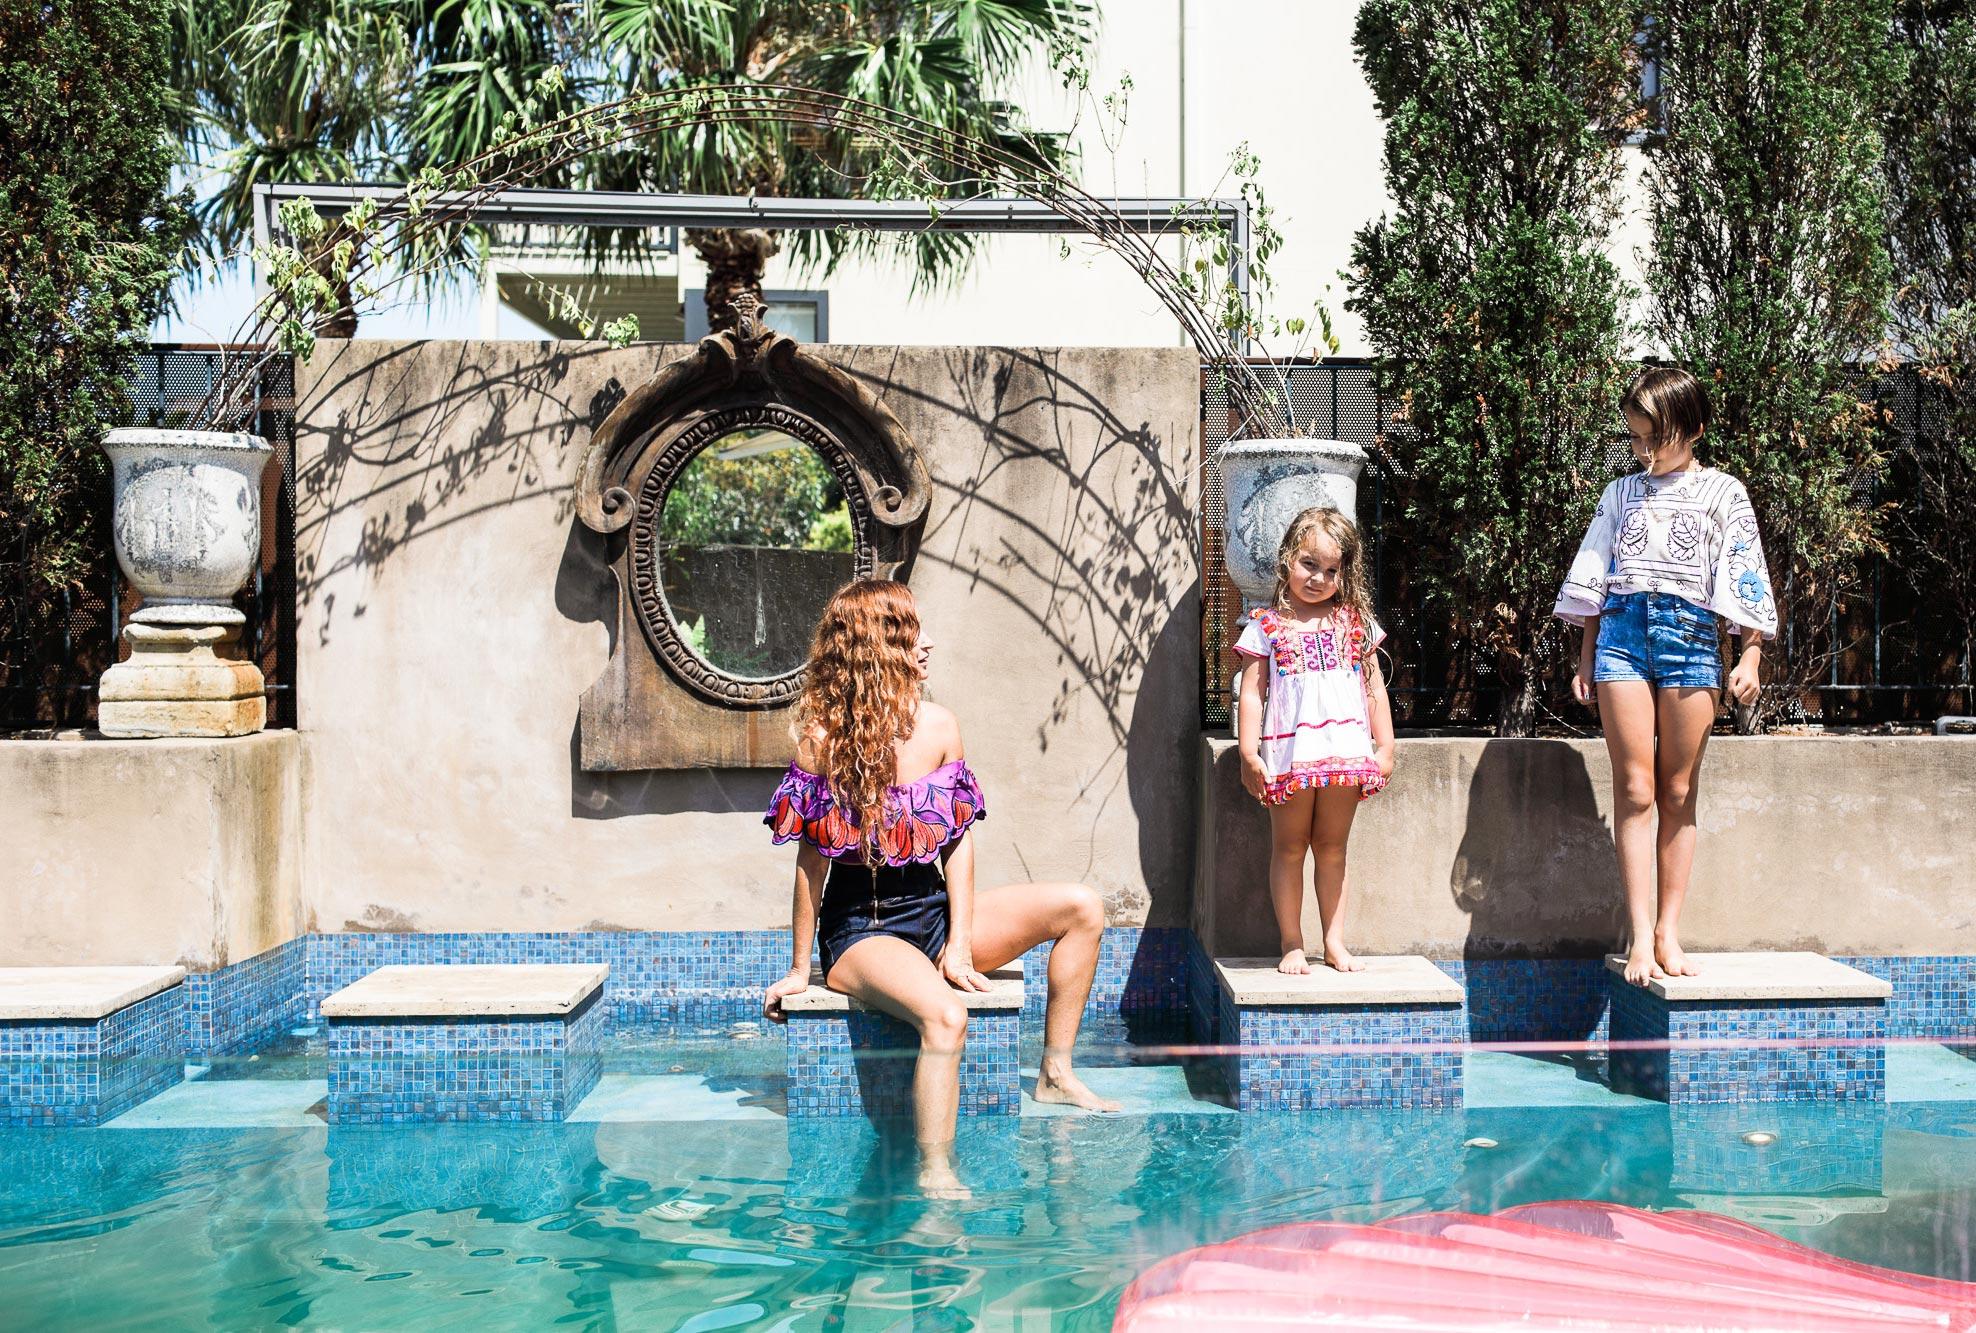 GRACE: Go inside fashion designer Alice McCall's bohemian abode